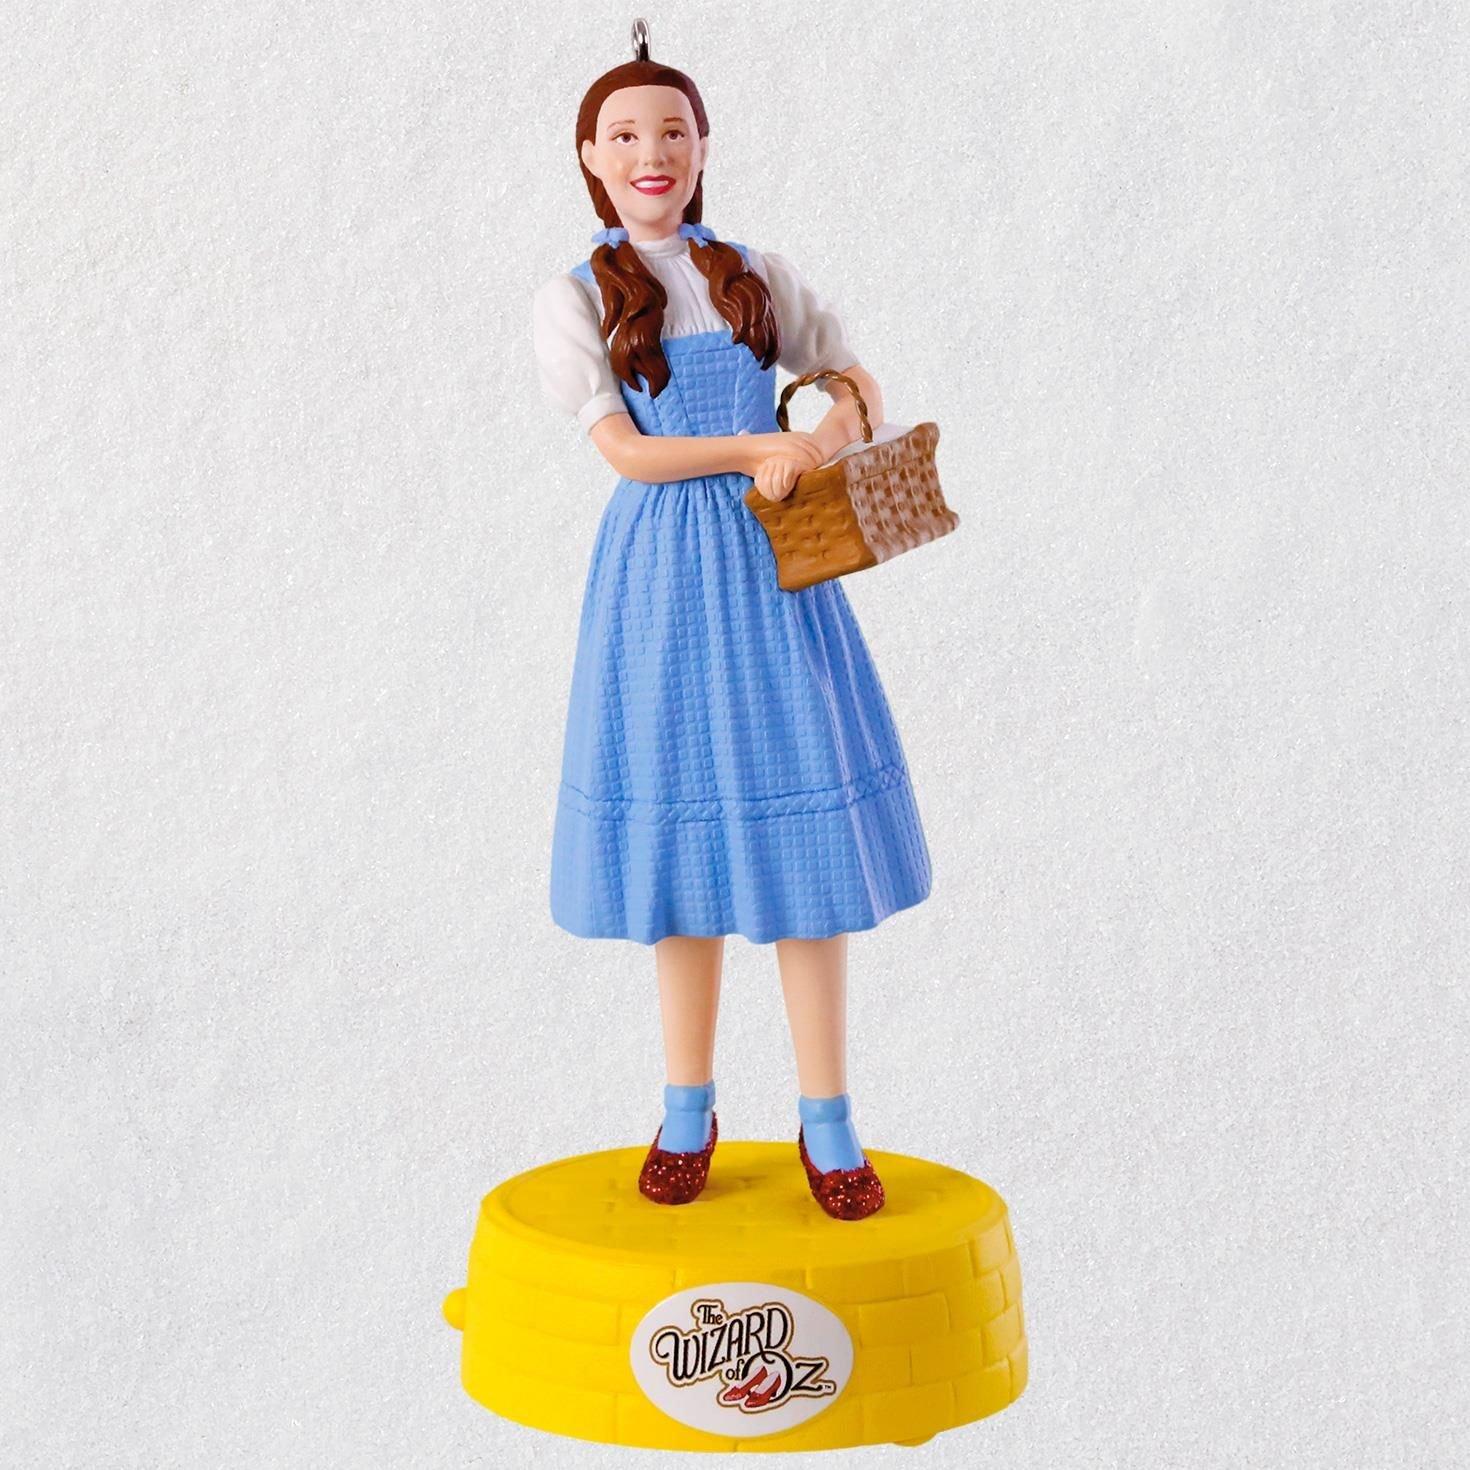 Hallmark The Wizard of Oz Somewhere Over the Rainbow Musical Ornament keepsake-ornaments Movies & TV